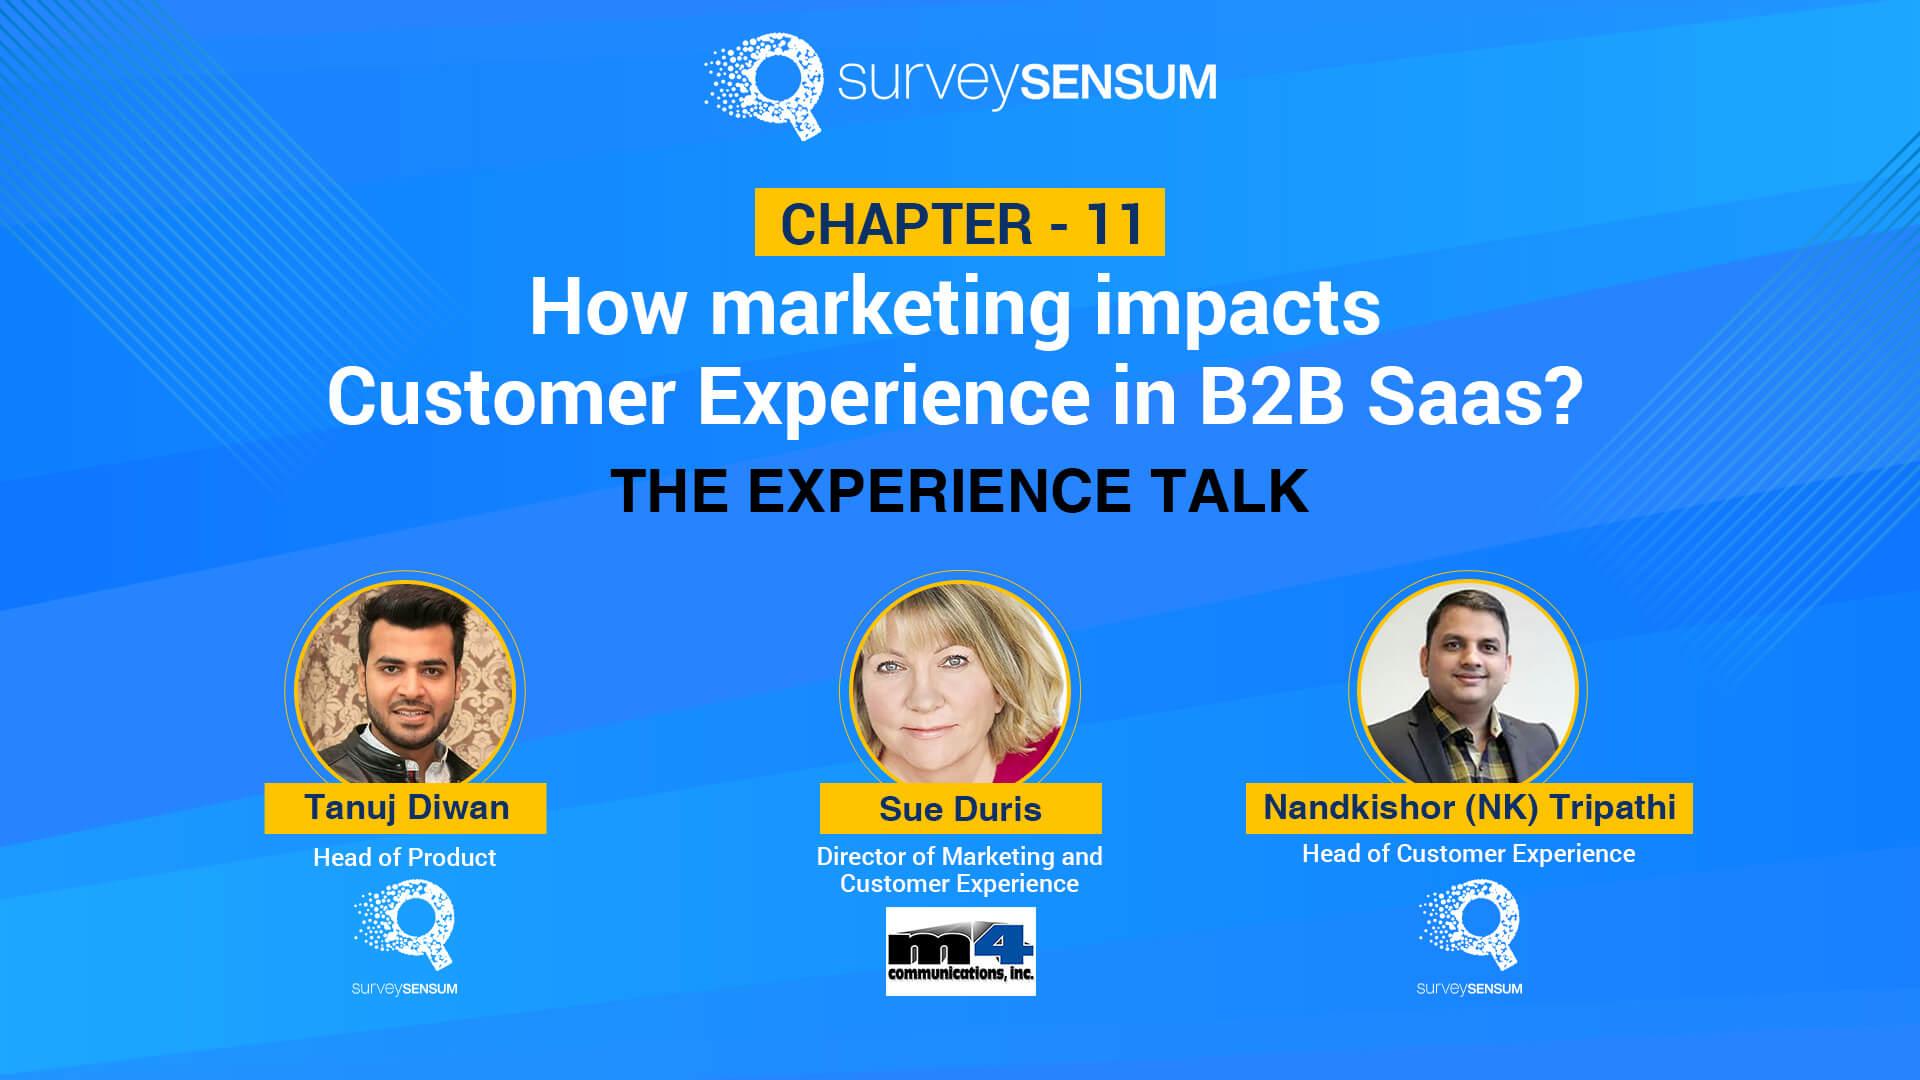 How marketing impacts Customer Experience in B2B Saas?